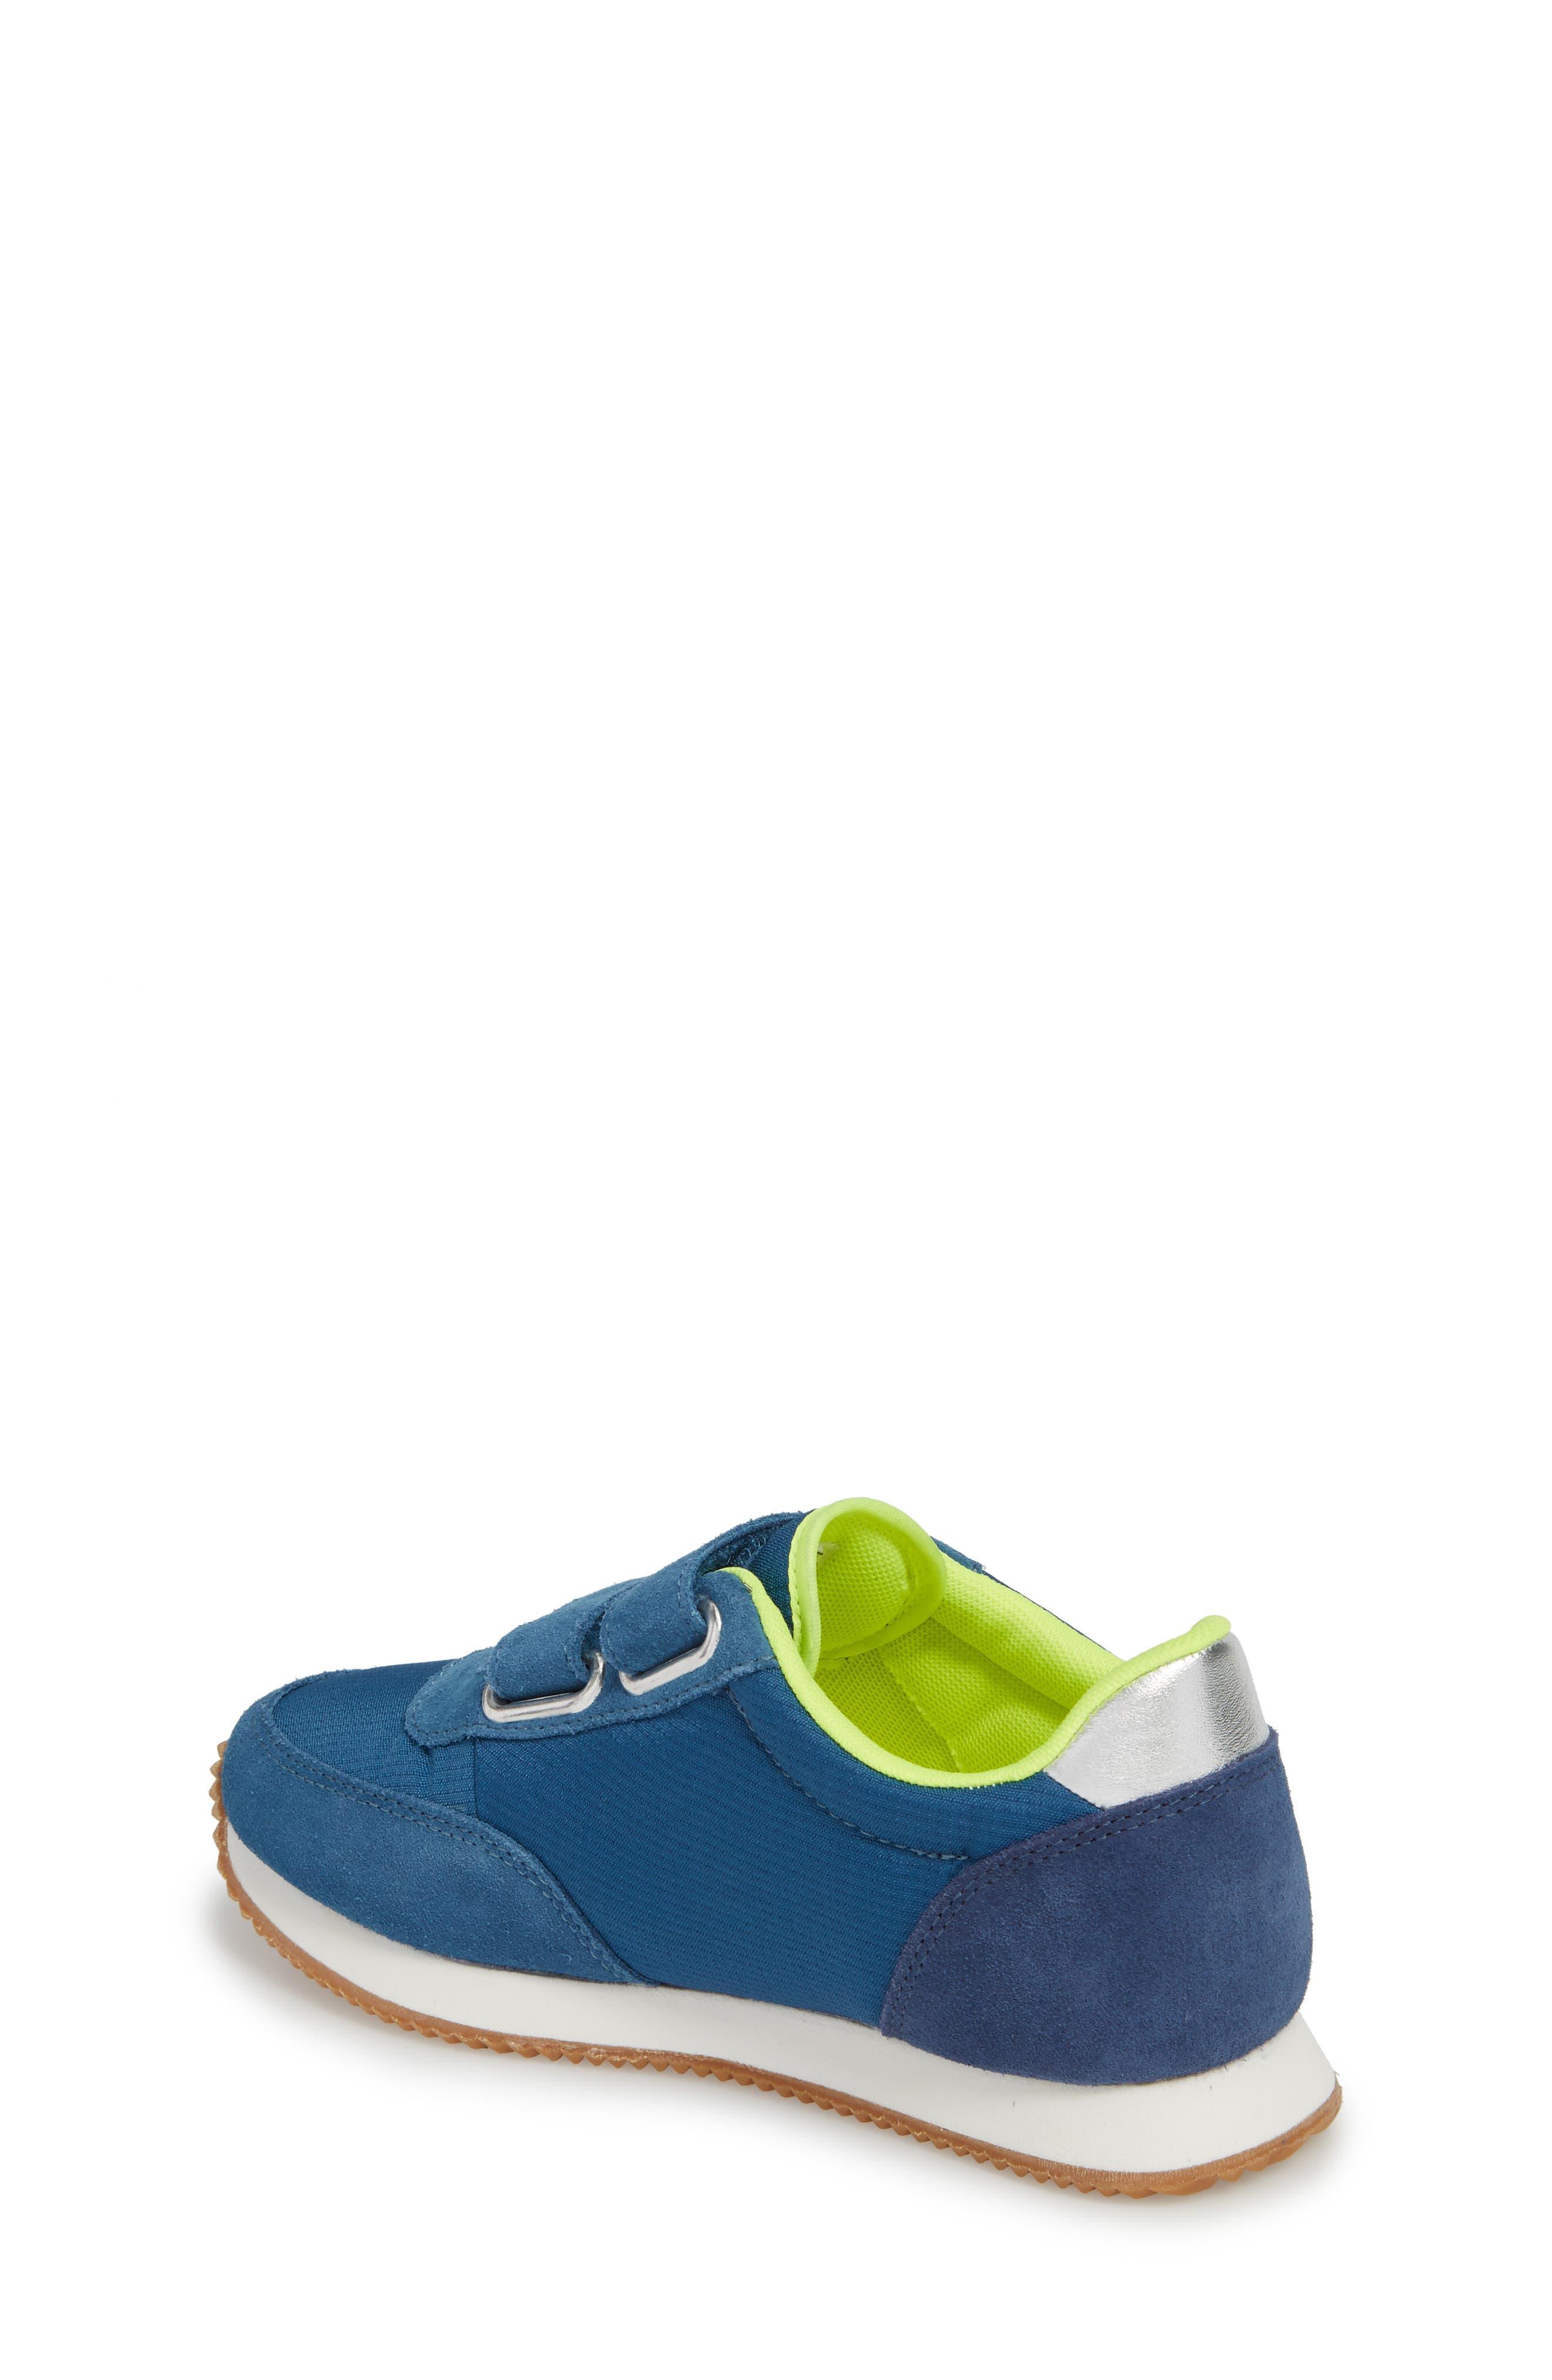 Alternate Image 2  - Mini Boden Print Sneakers (Toddler, Little Kid & Big Kid)